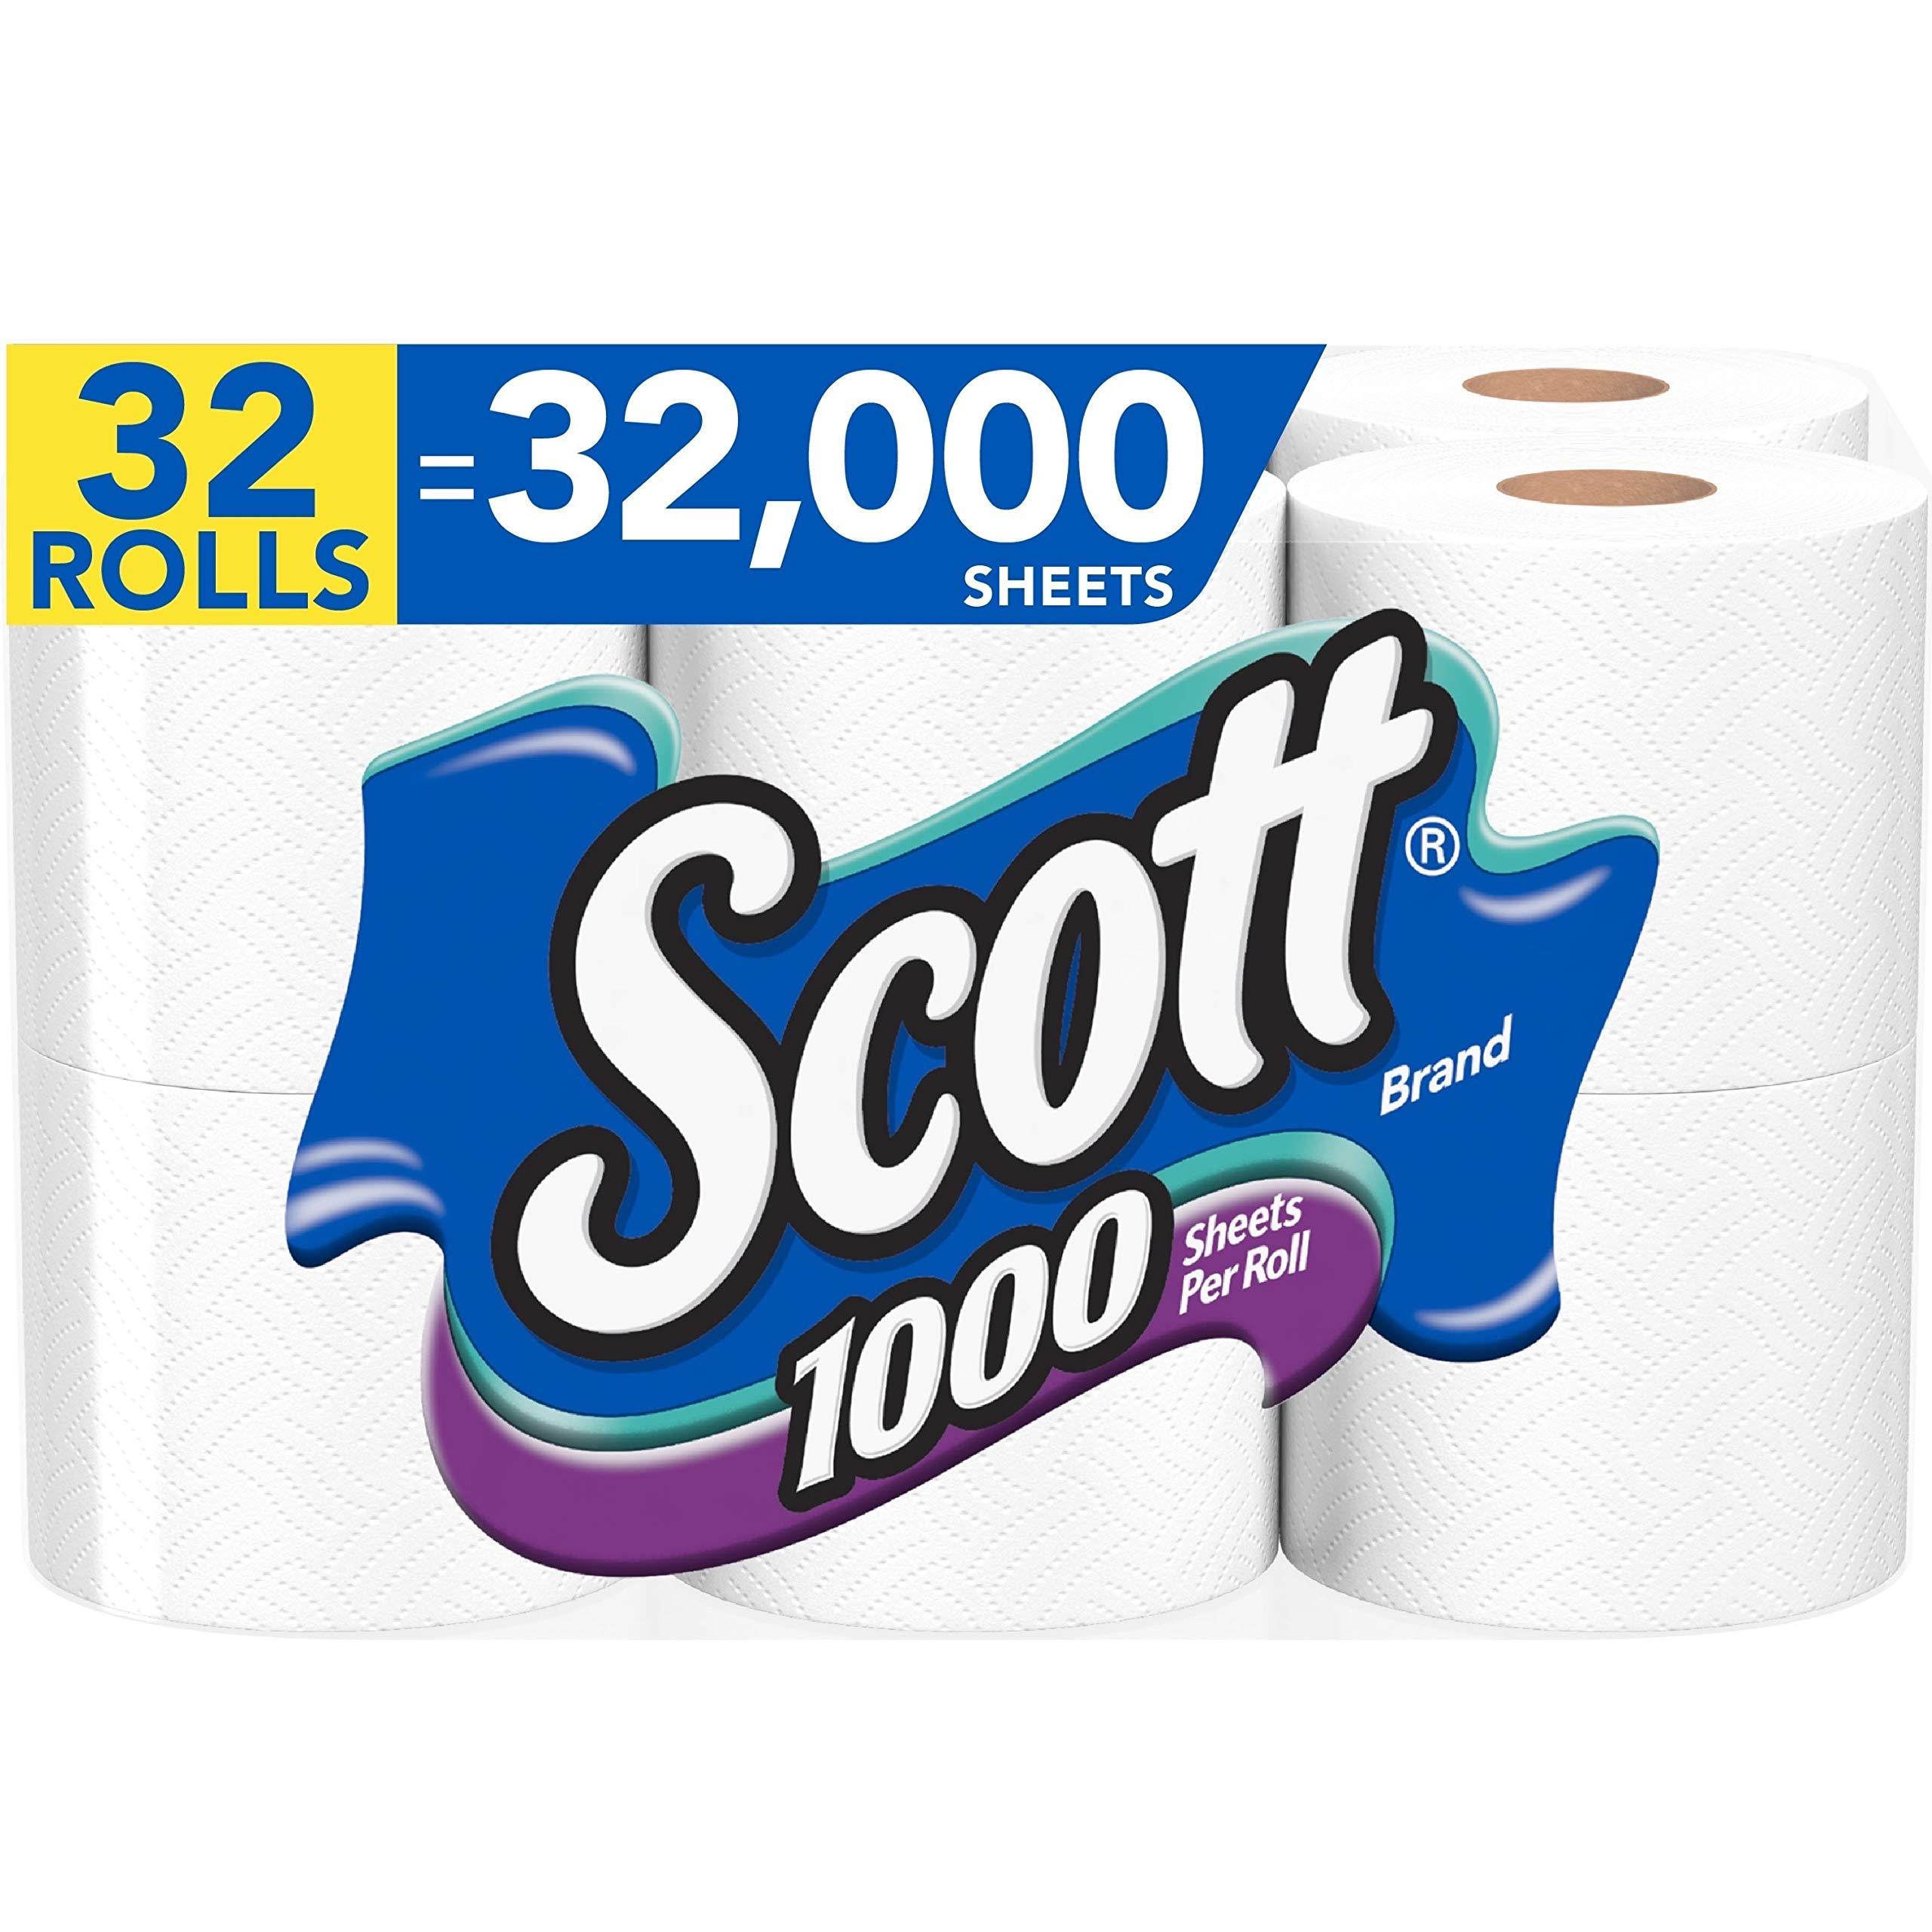 Scott 1000 Sheets Per Roll Toilet Paper, 4 Packs of 8 Rolls (32 Rolls Total) Bath Tissue